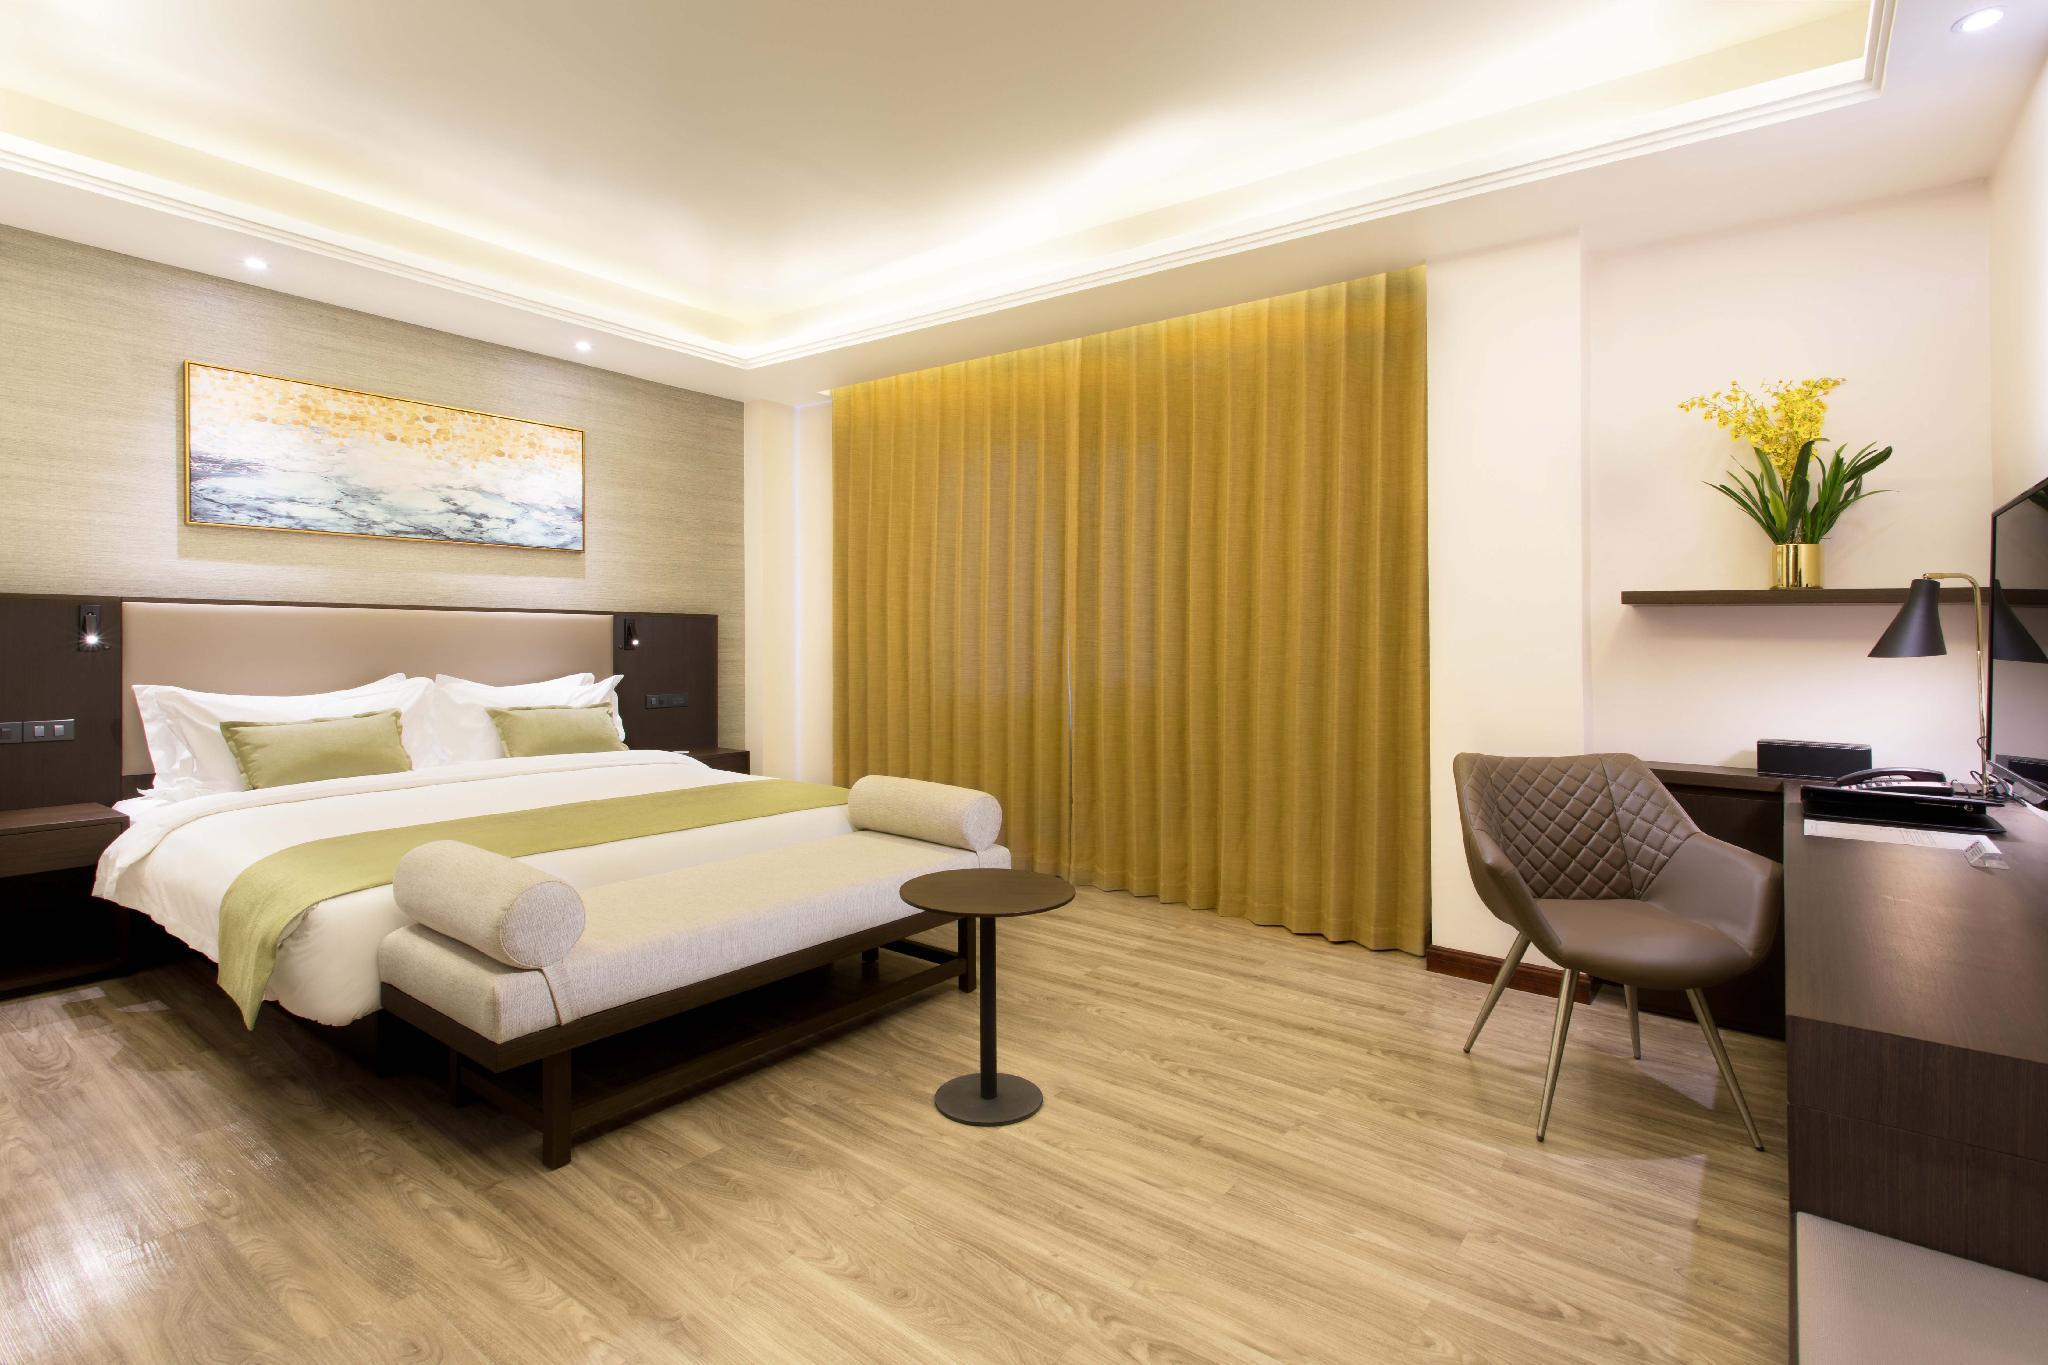 The Marison Hotel Legazpi Philippines Photos Room